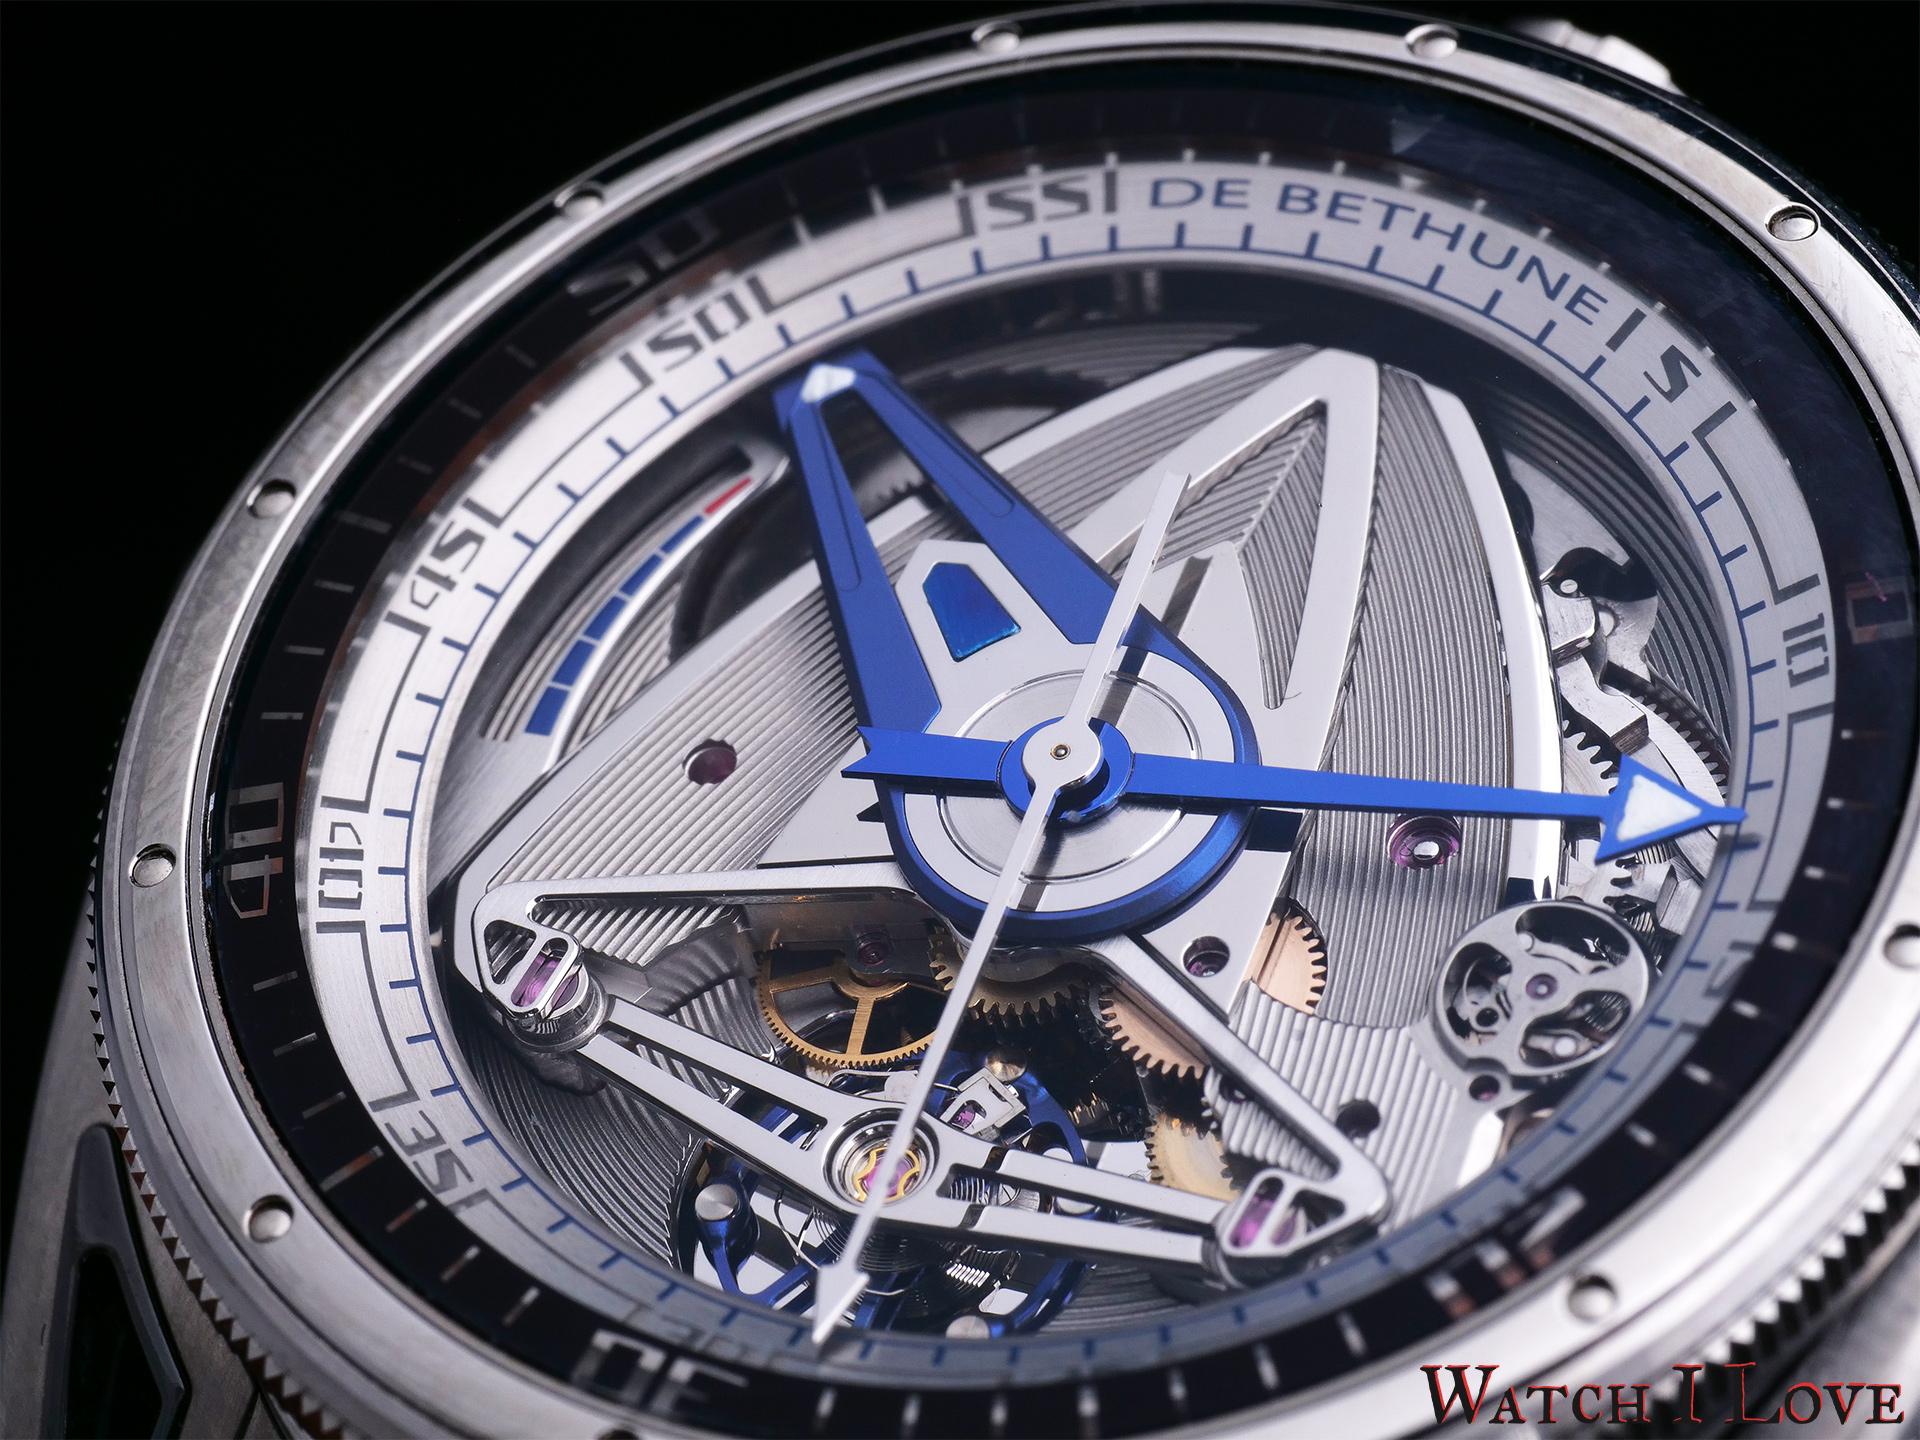 De Bethune DB28GS Grand Bleu dial